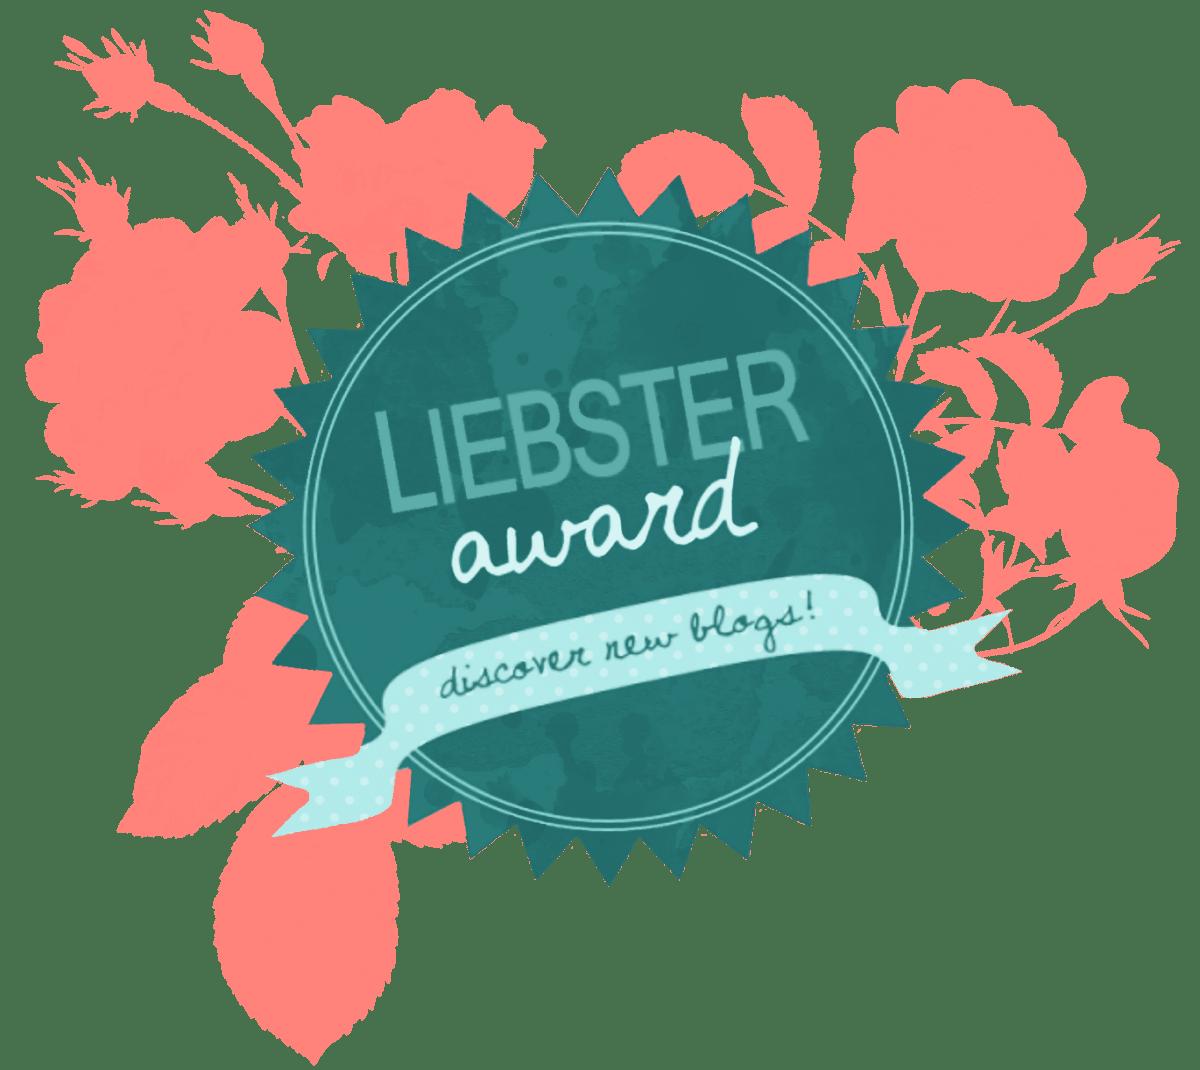 hesaidorshesaid liebster award 2018